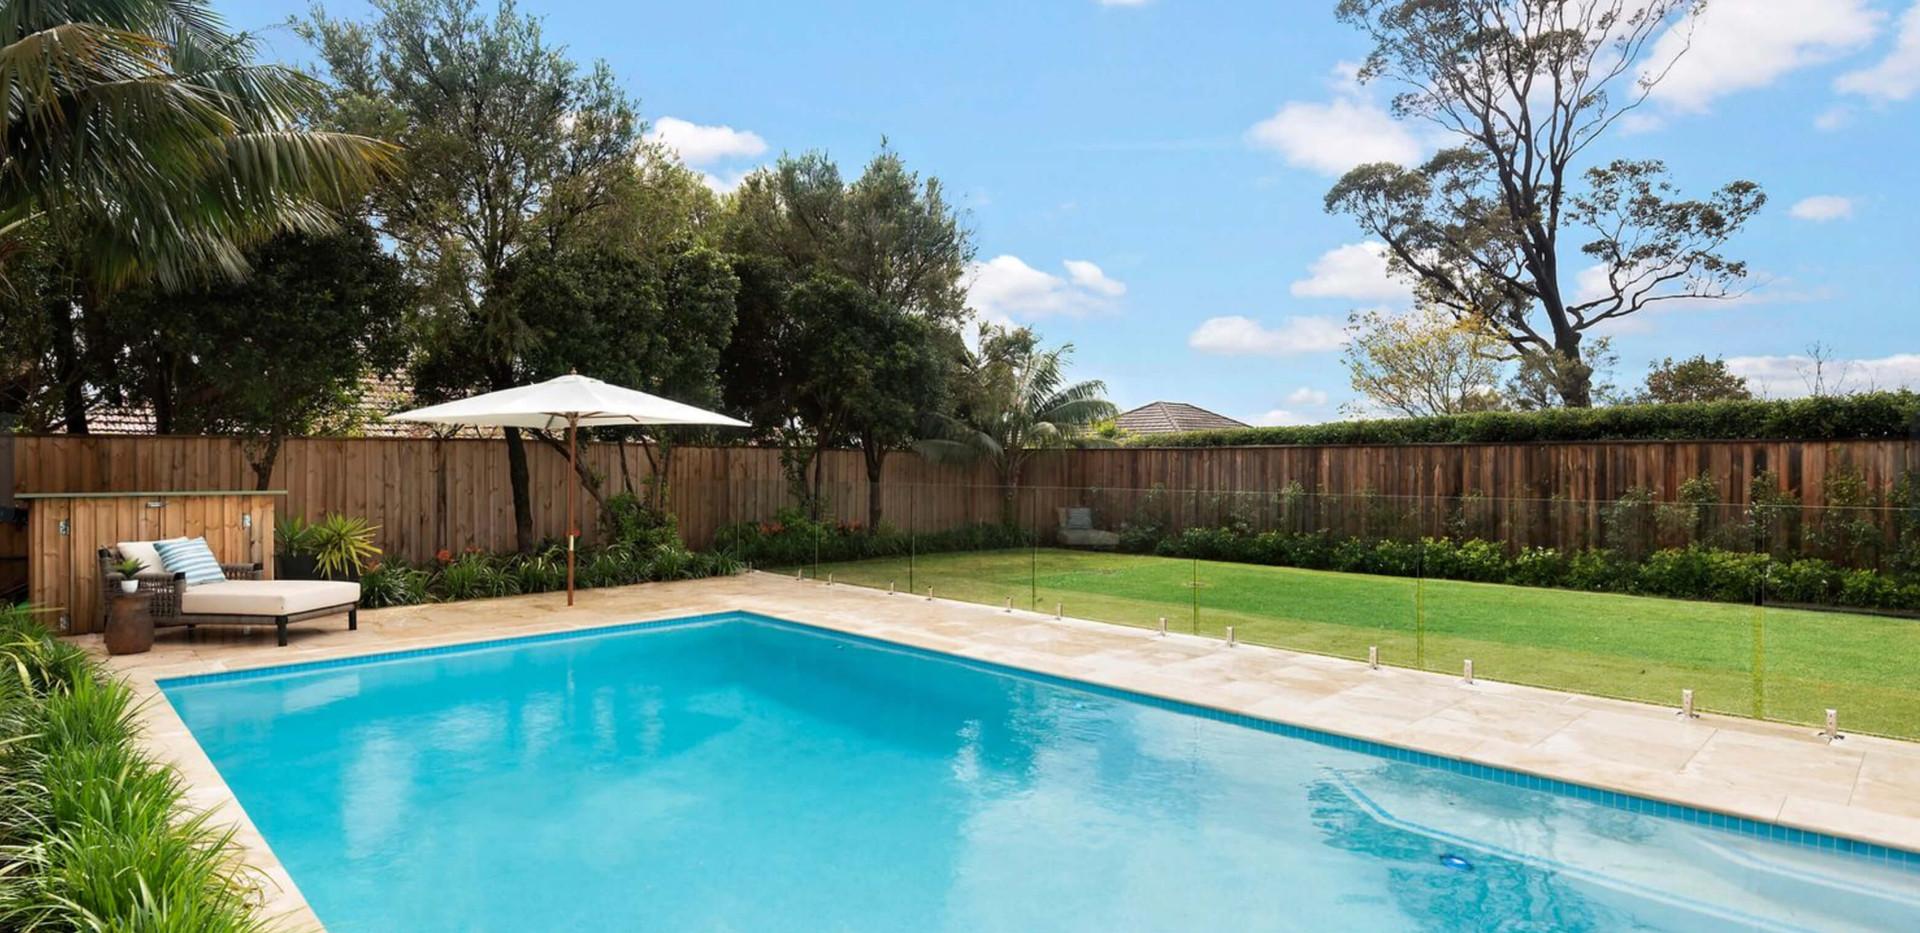 Seaforth Hamptons House - Residential pool design